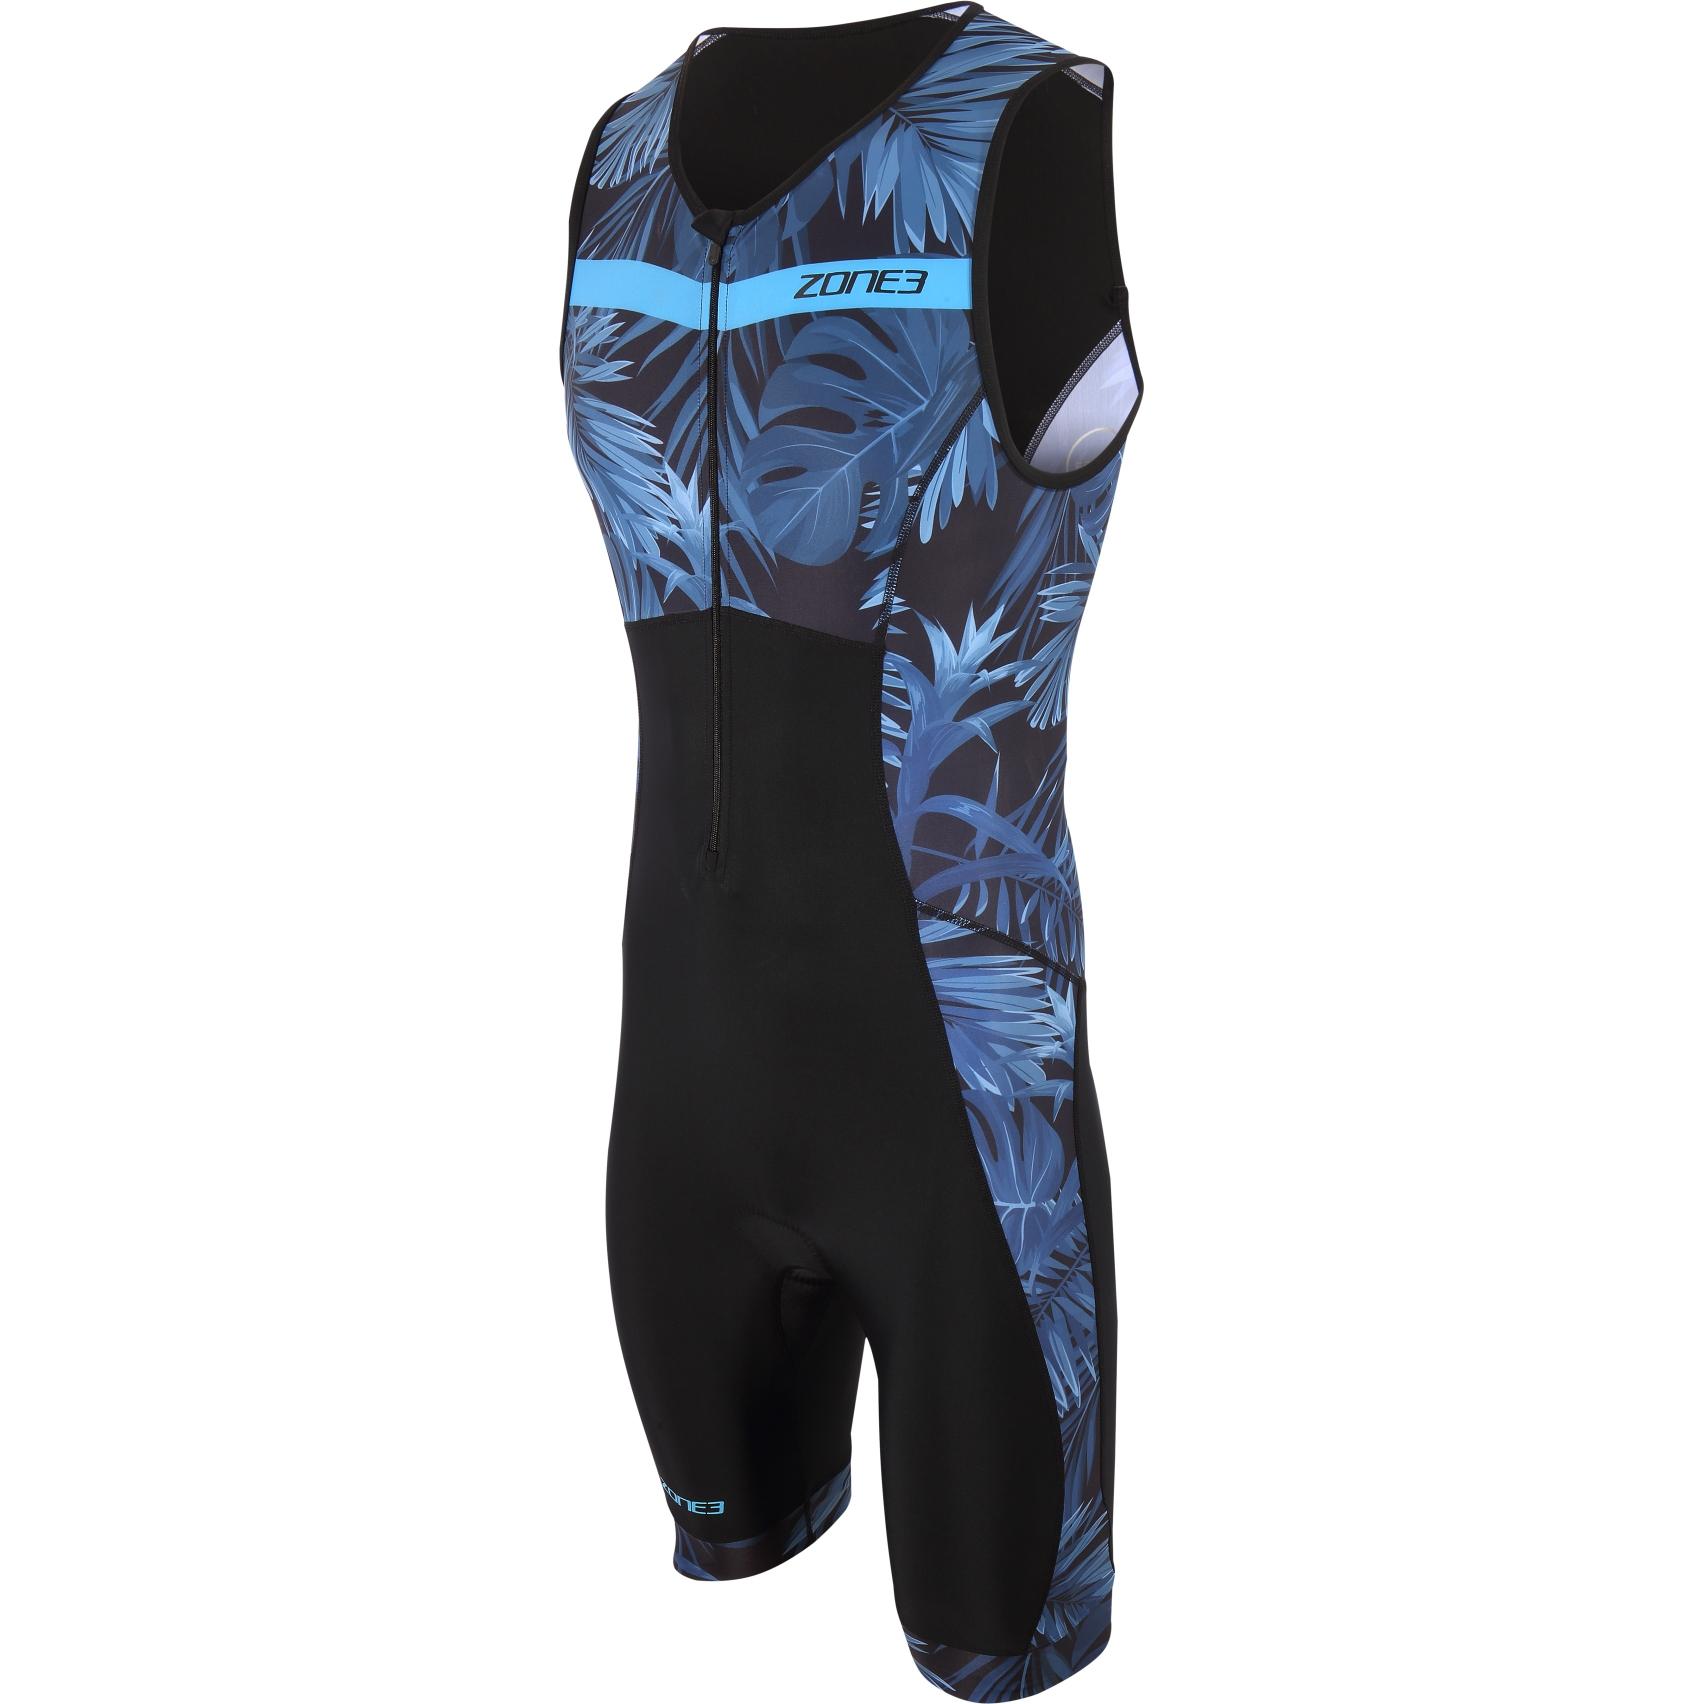 Zone3 Men's Activate+ Tropical Palm Sleeveless Trisuit - navy/blue